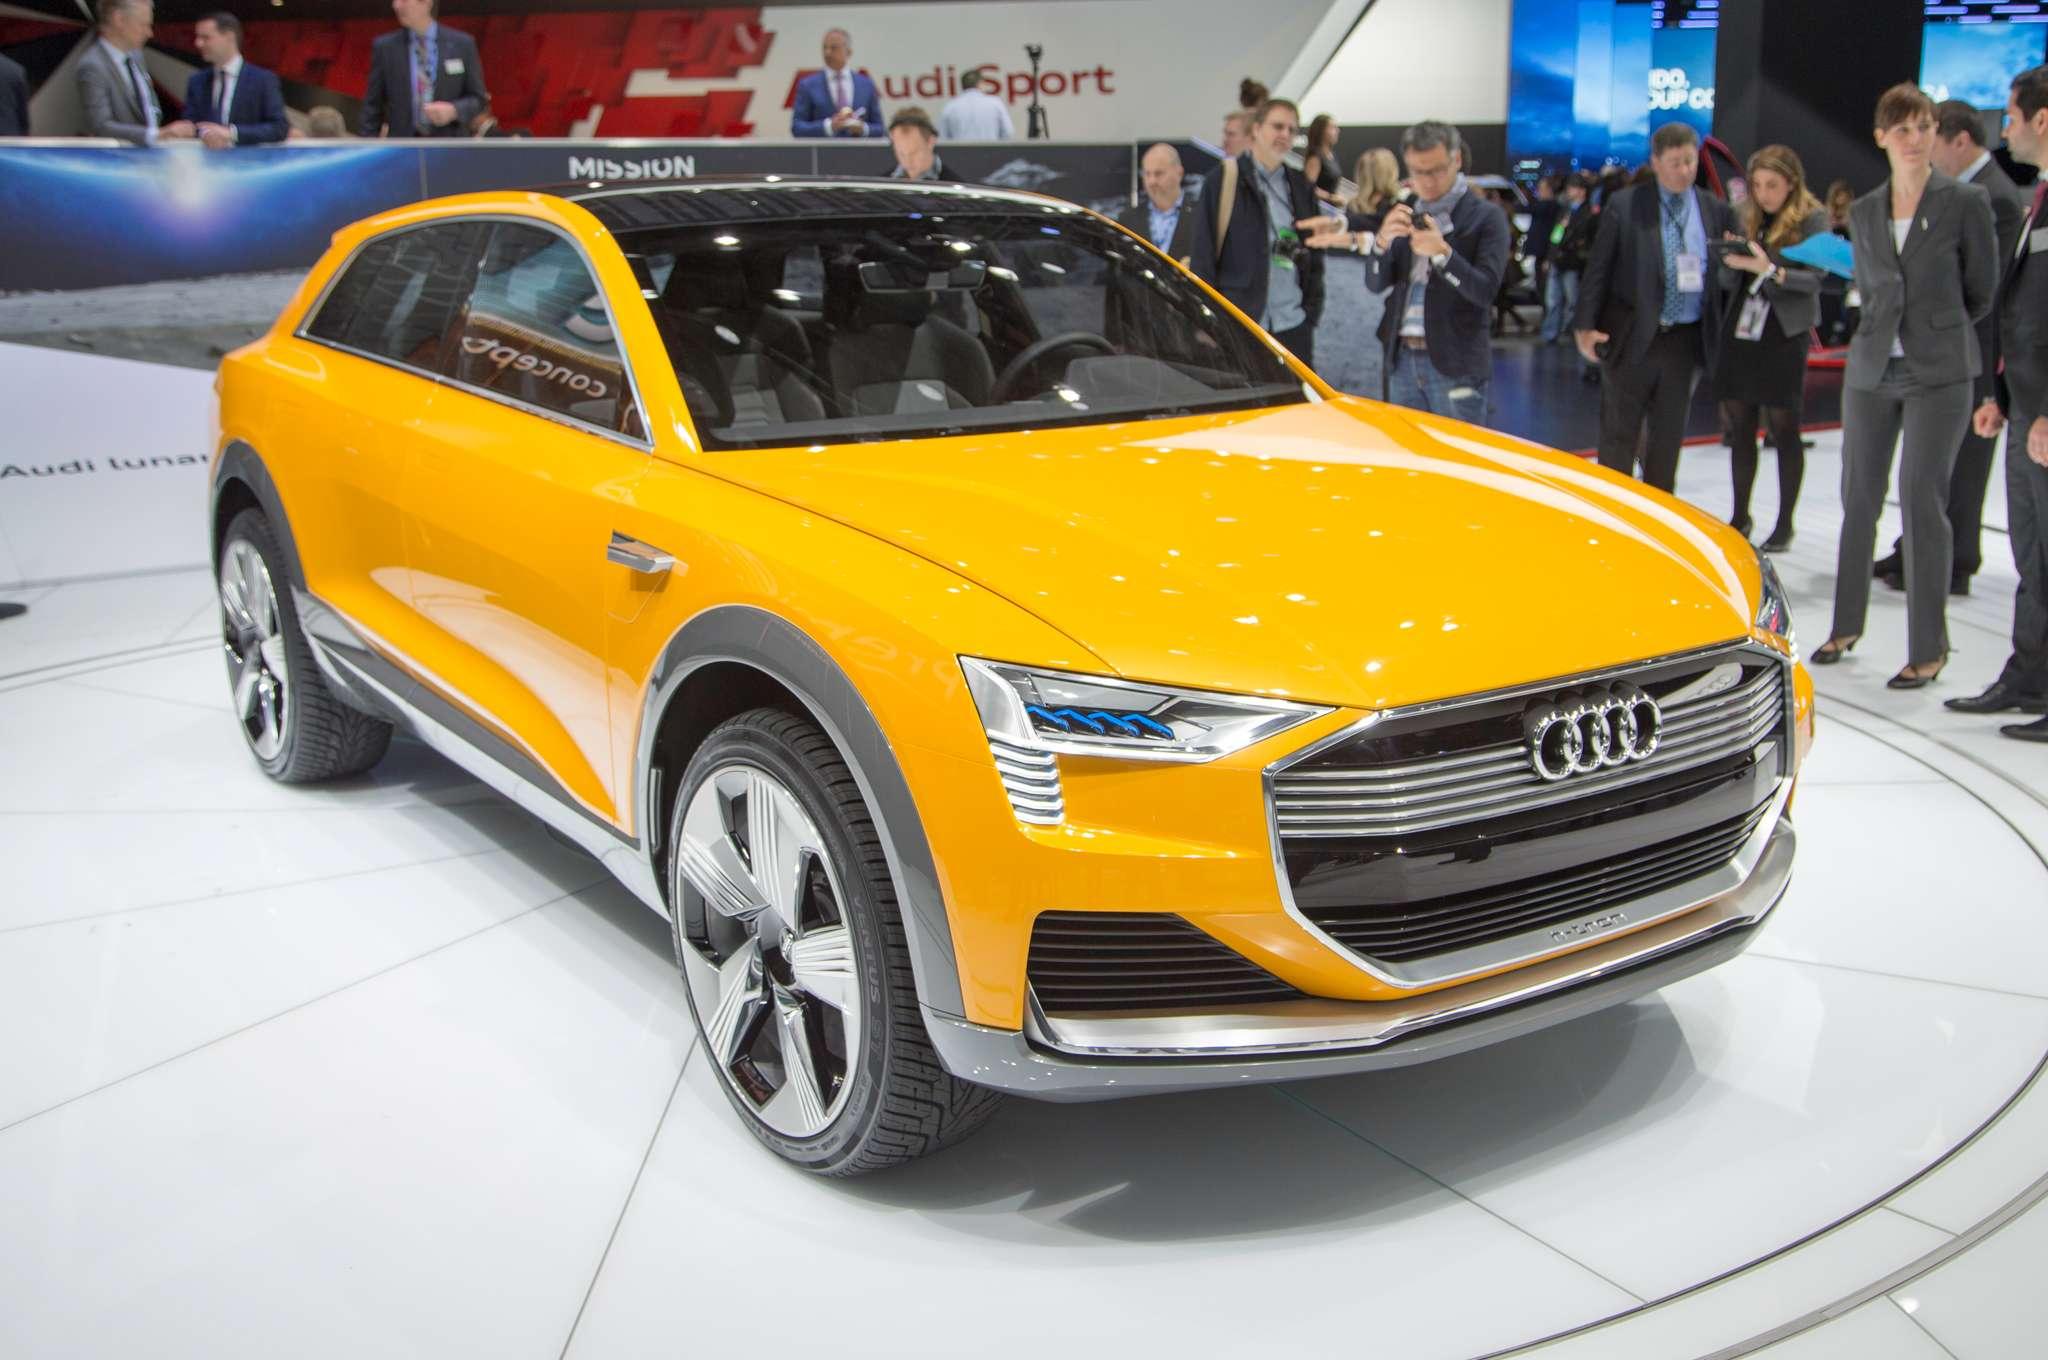 New Audi Q6 H-Tron, A Hydrogen Powered Car